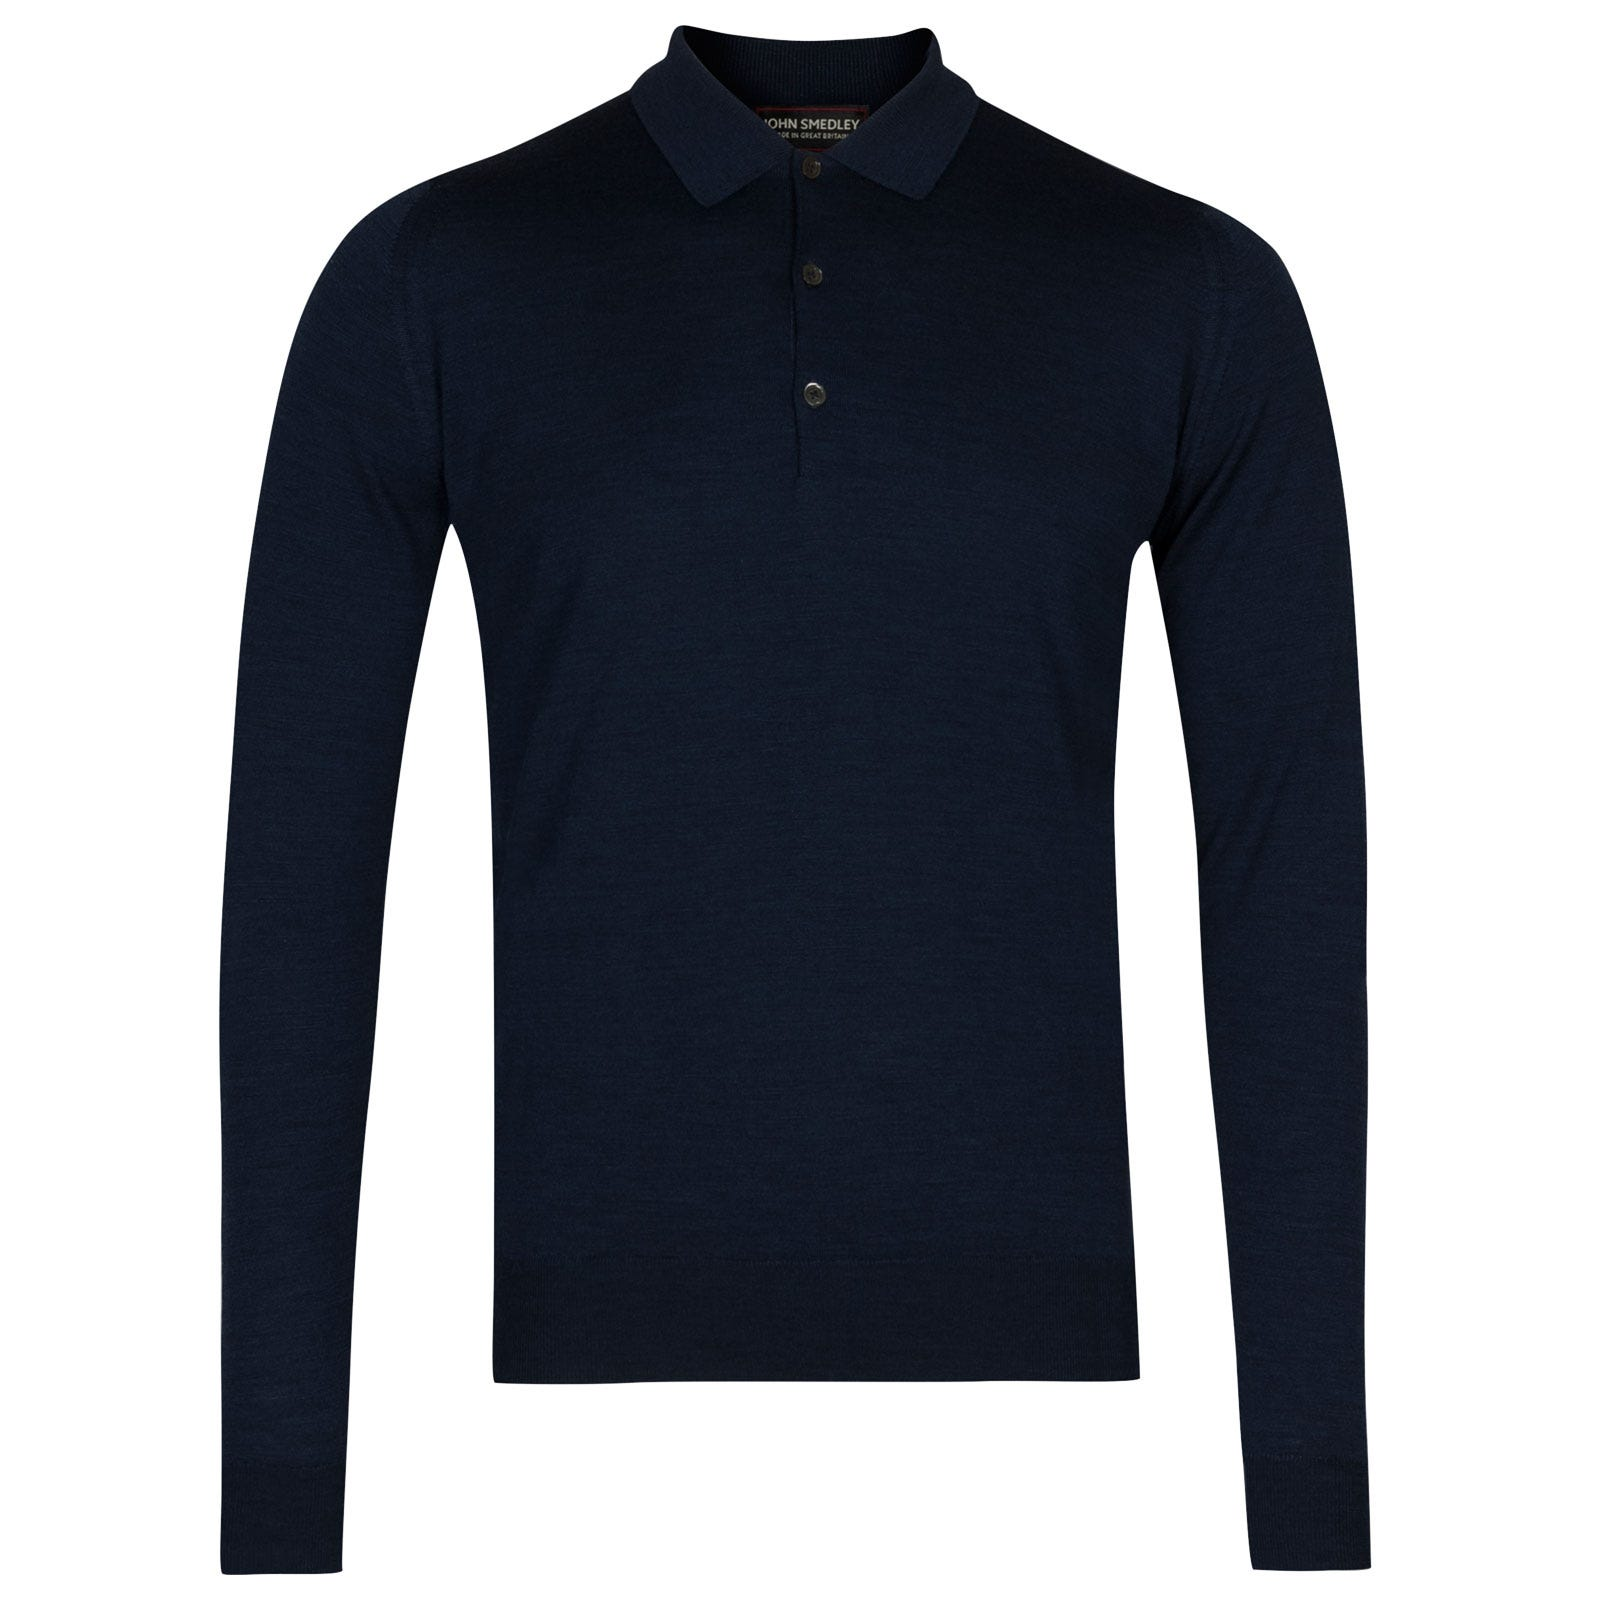 John Smedley belper Merino Wool Shirt in Indigo-XL